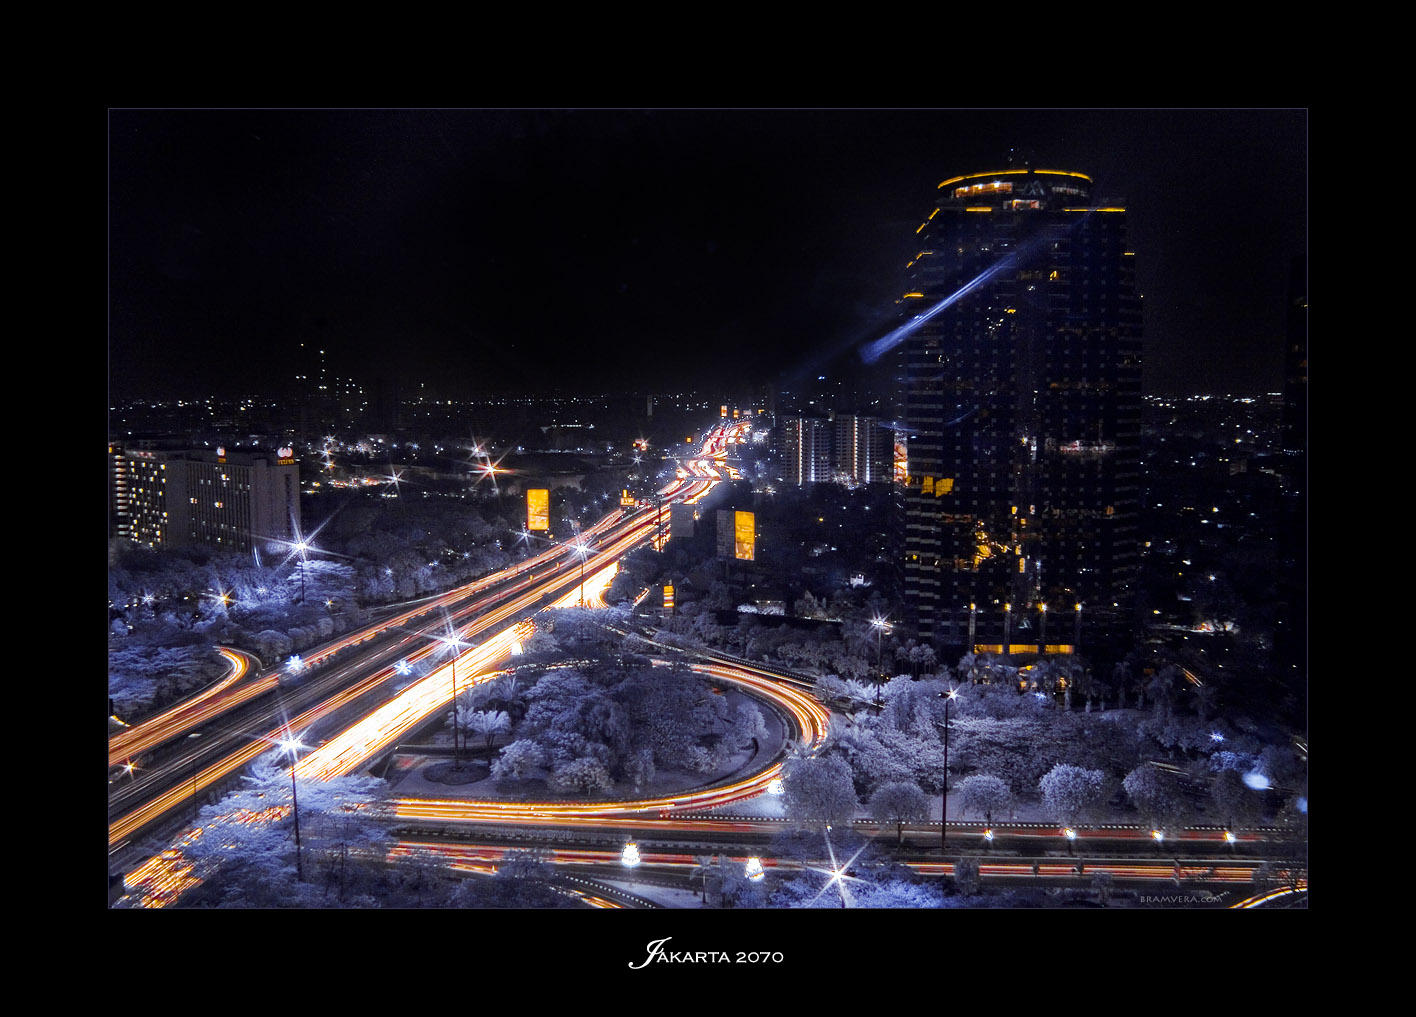 INFRARED: Jakarta 2070 by brumie